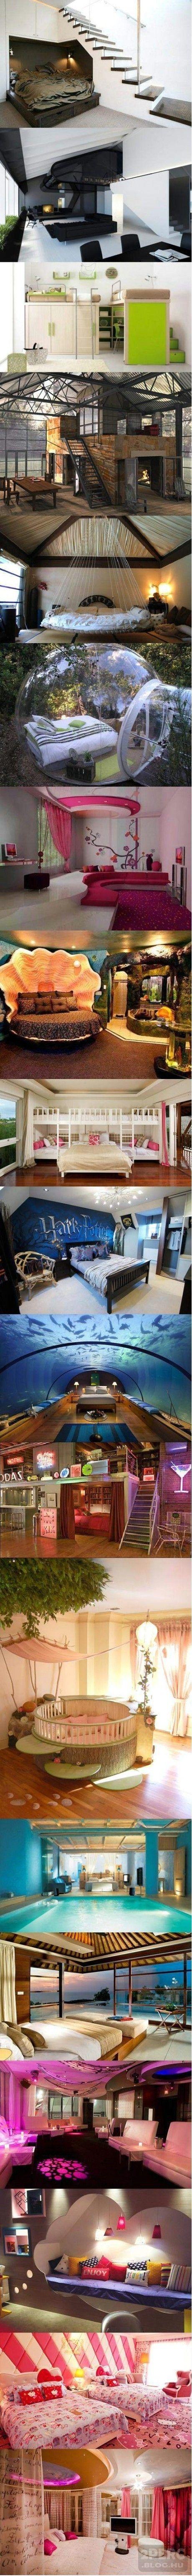 beds: Dreams Bedrooms, Dreams Home, Cool Bedrooms, Dreams Rooms, Dreams House, Awesome Bedrooms, Harry Potter, Bedrooms Ideas, Cool Rooms